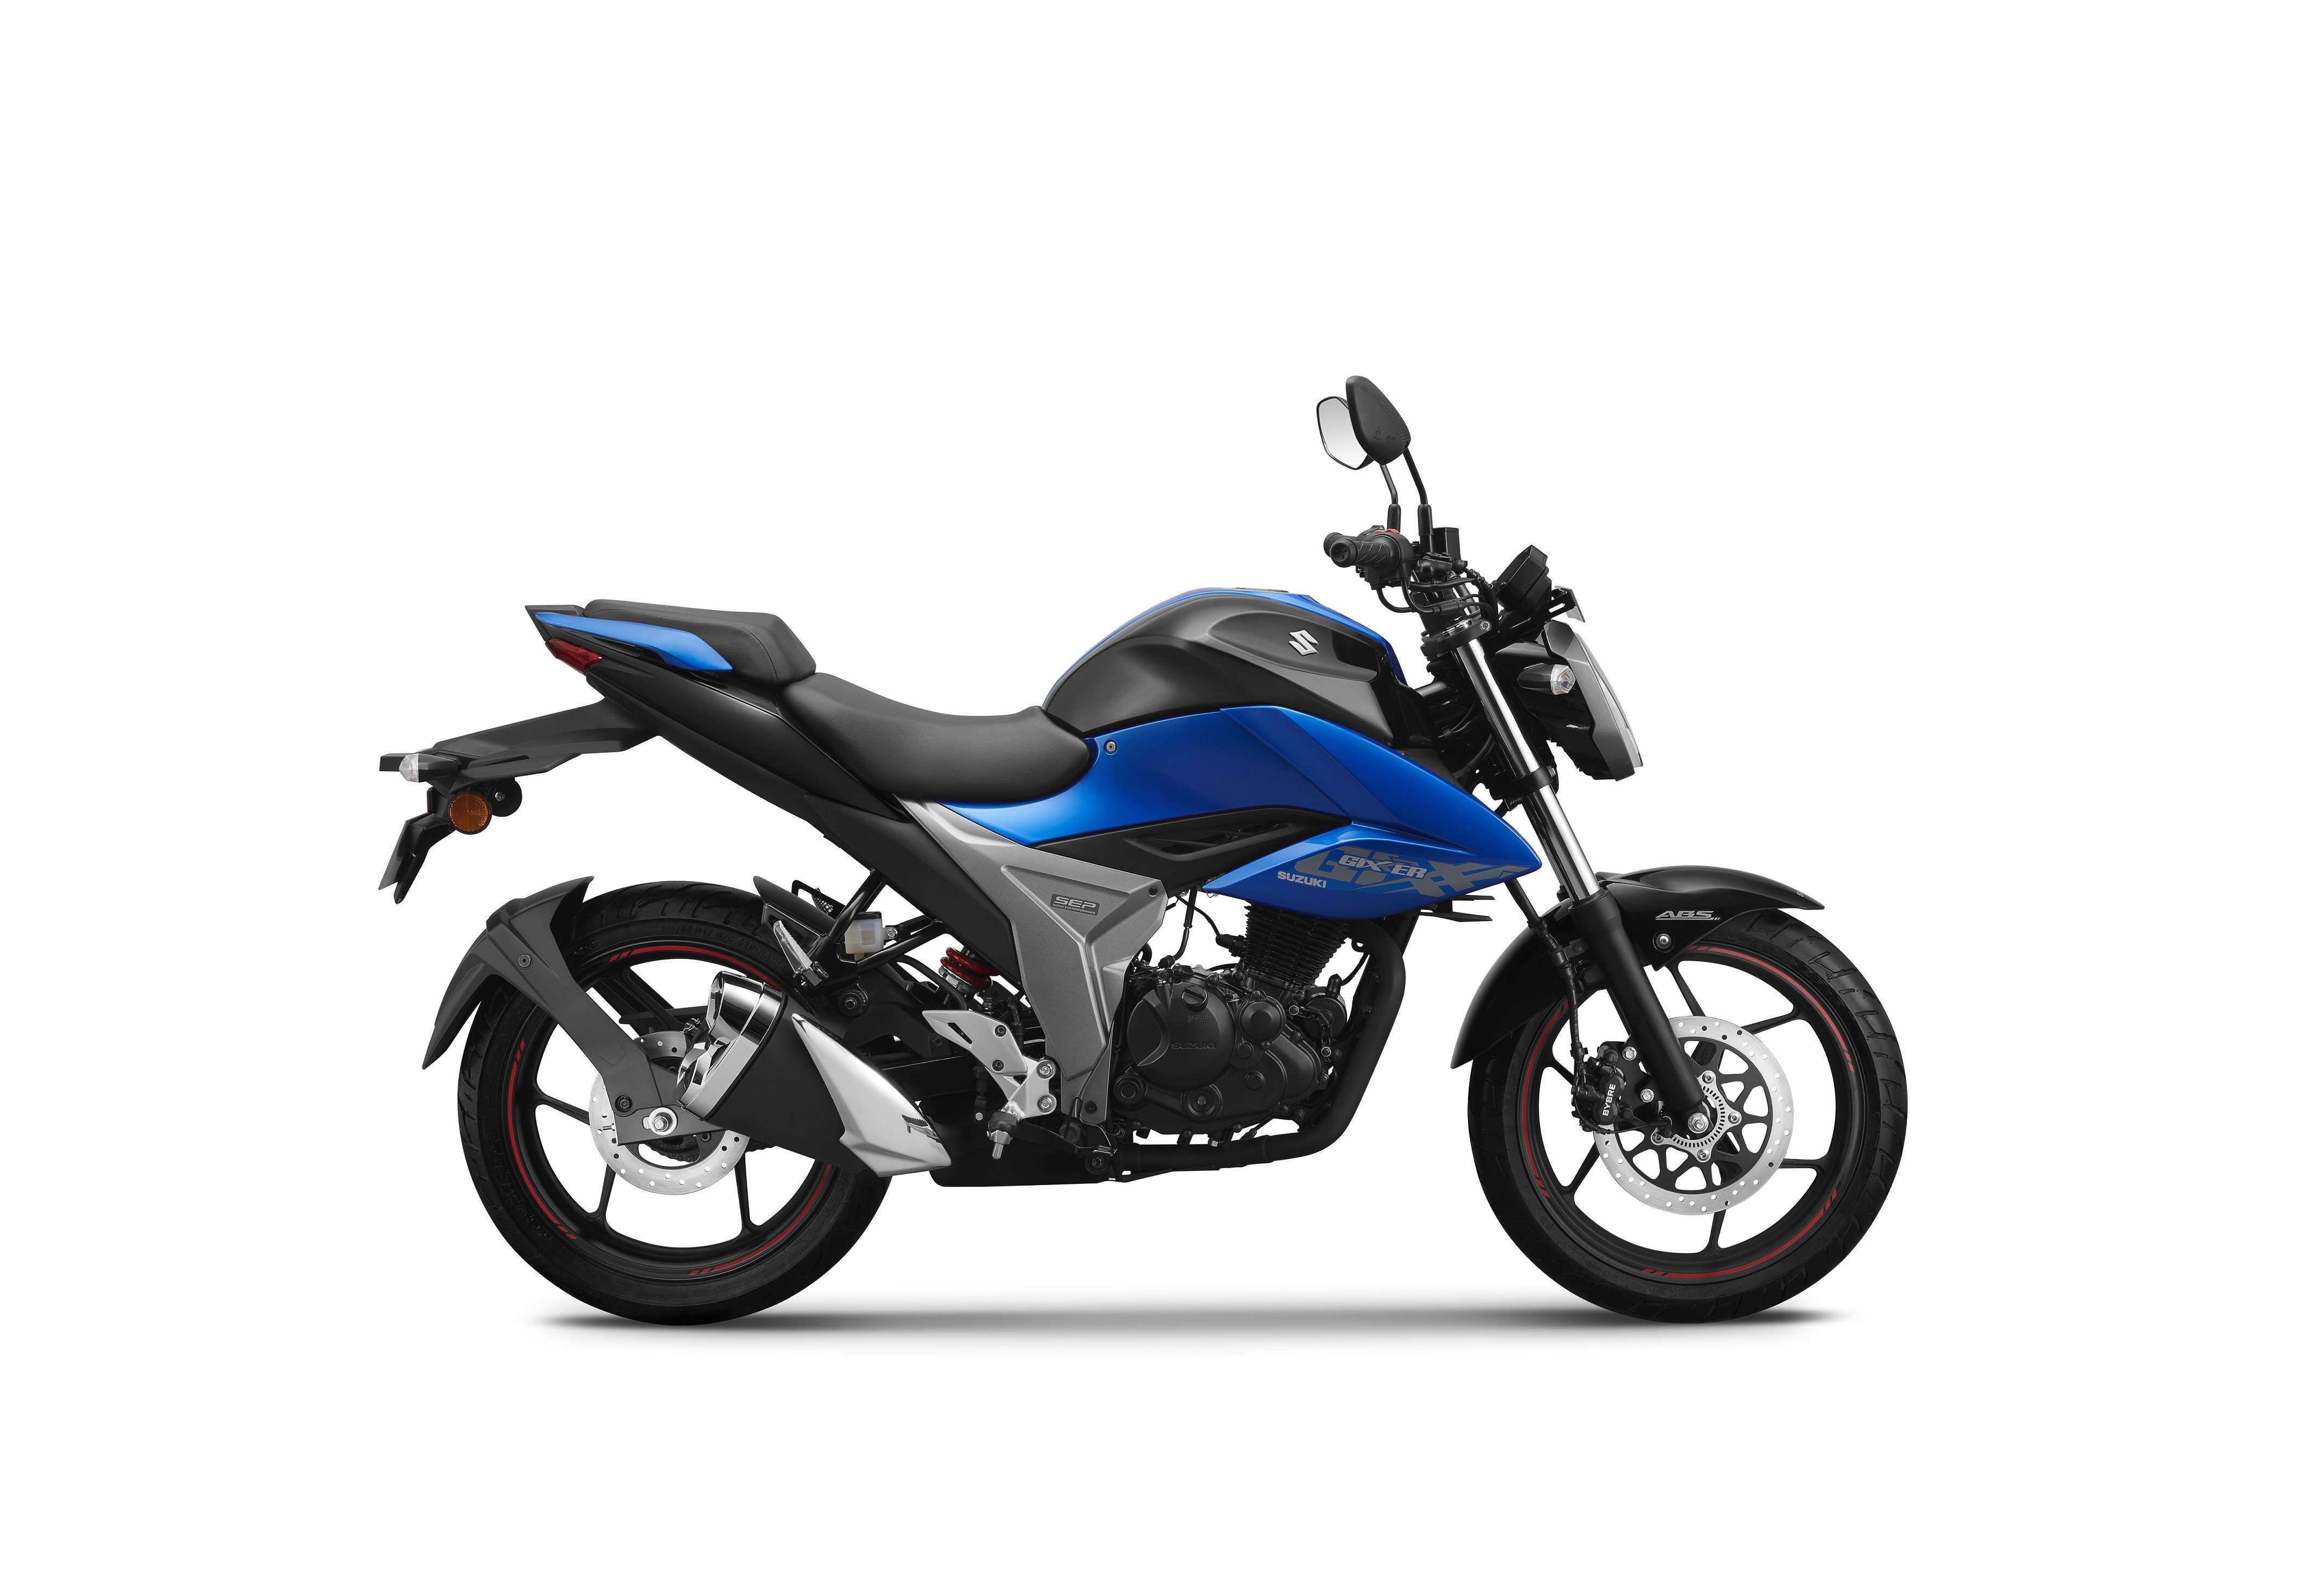 The new Suzuki Gixxer comes in three colour options – Metallic Sonic Silver & Glass Sparkle Black; Glass Sparkle Black and Metallic Triton Blue & Glass Sparkle Black.